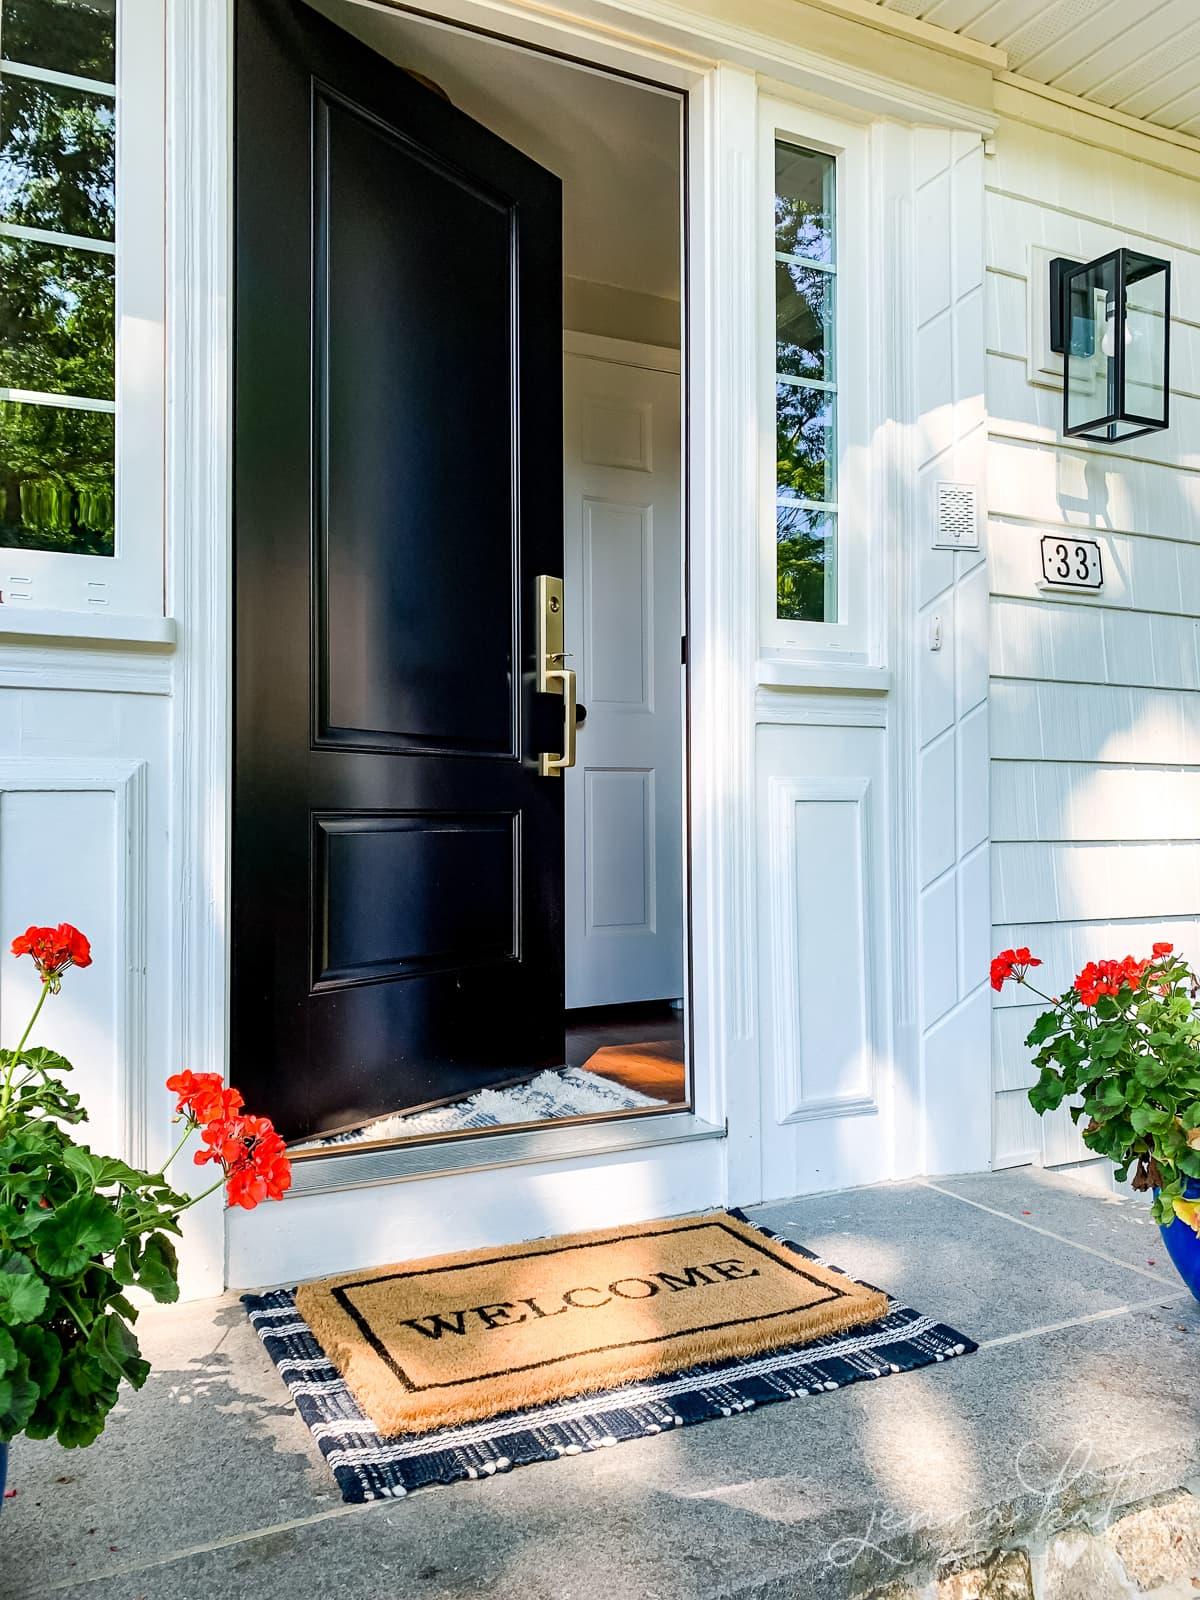 Welcome door mat at the front door to wipe feet off before entering the house